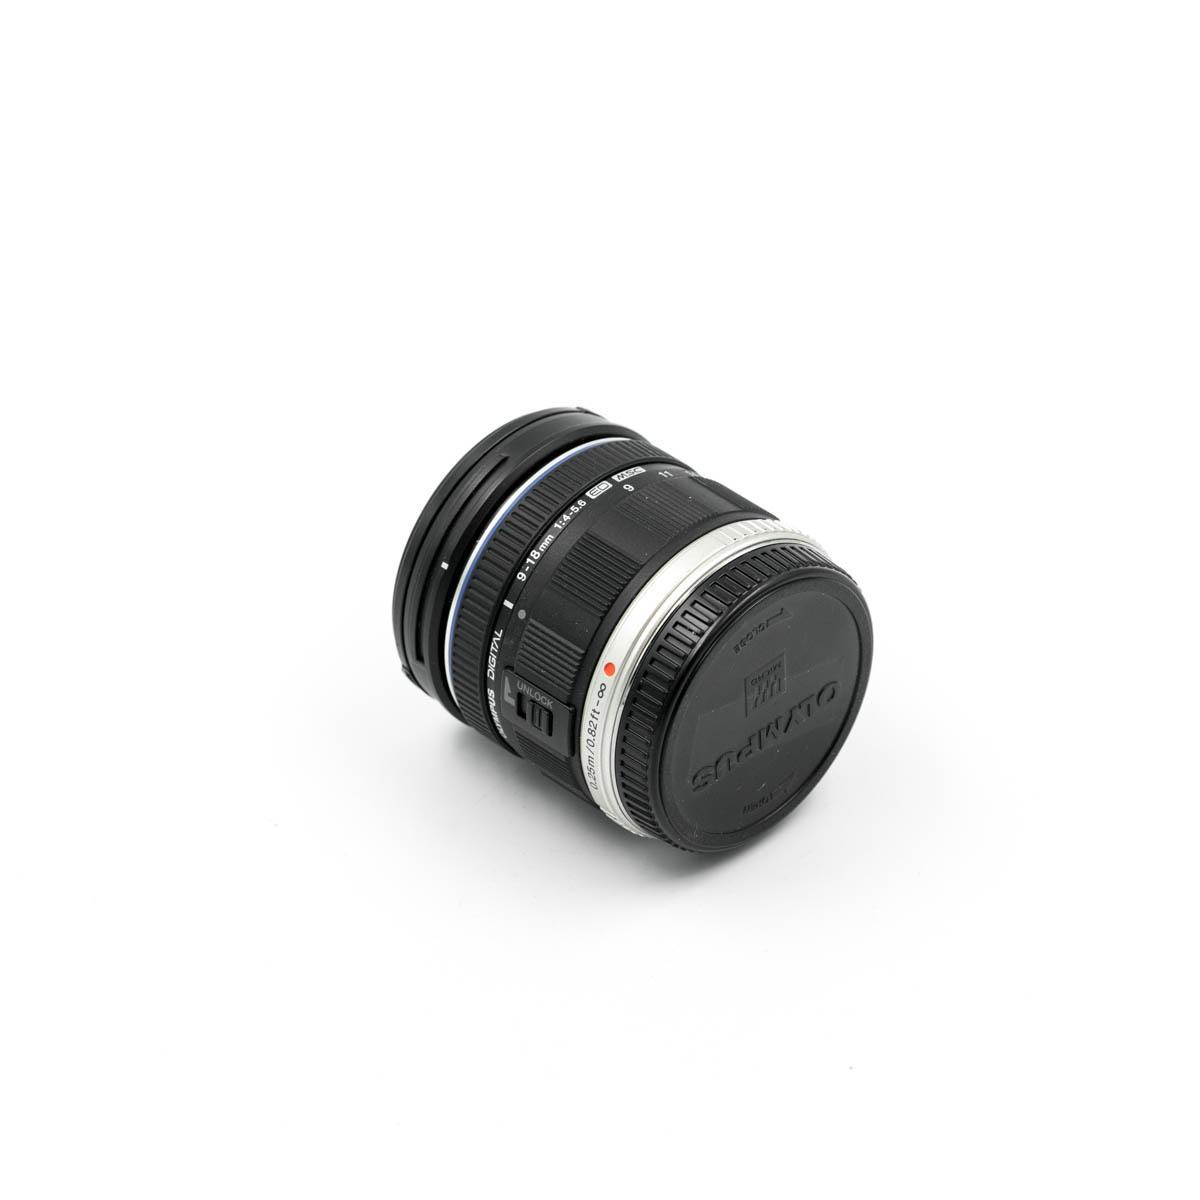 olympus 9-18mm 4-5.6 ed